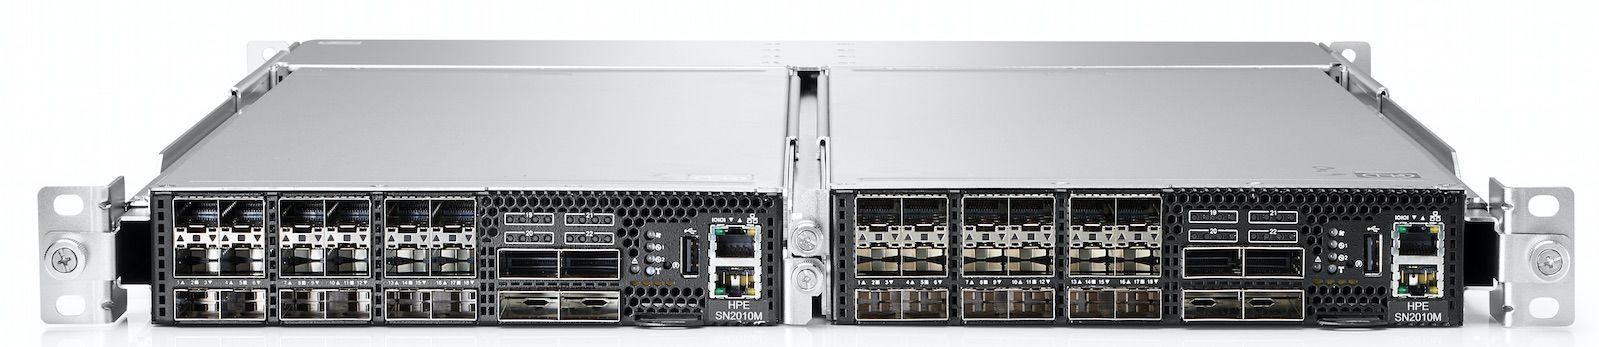 SN2010M_25GbE_4QSFP28 SwitchMount 2.jpg